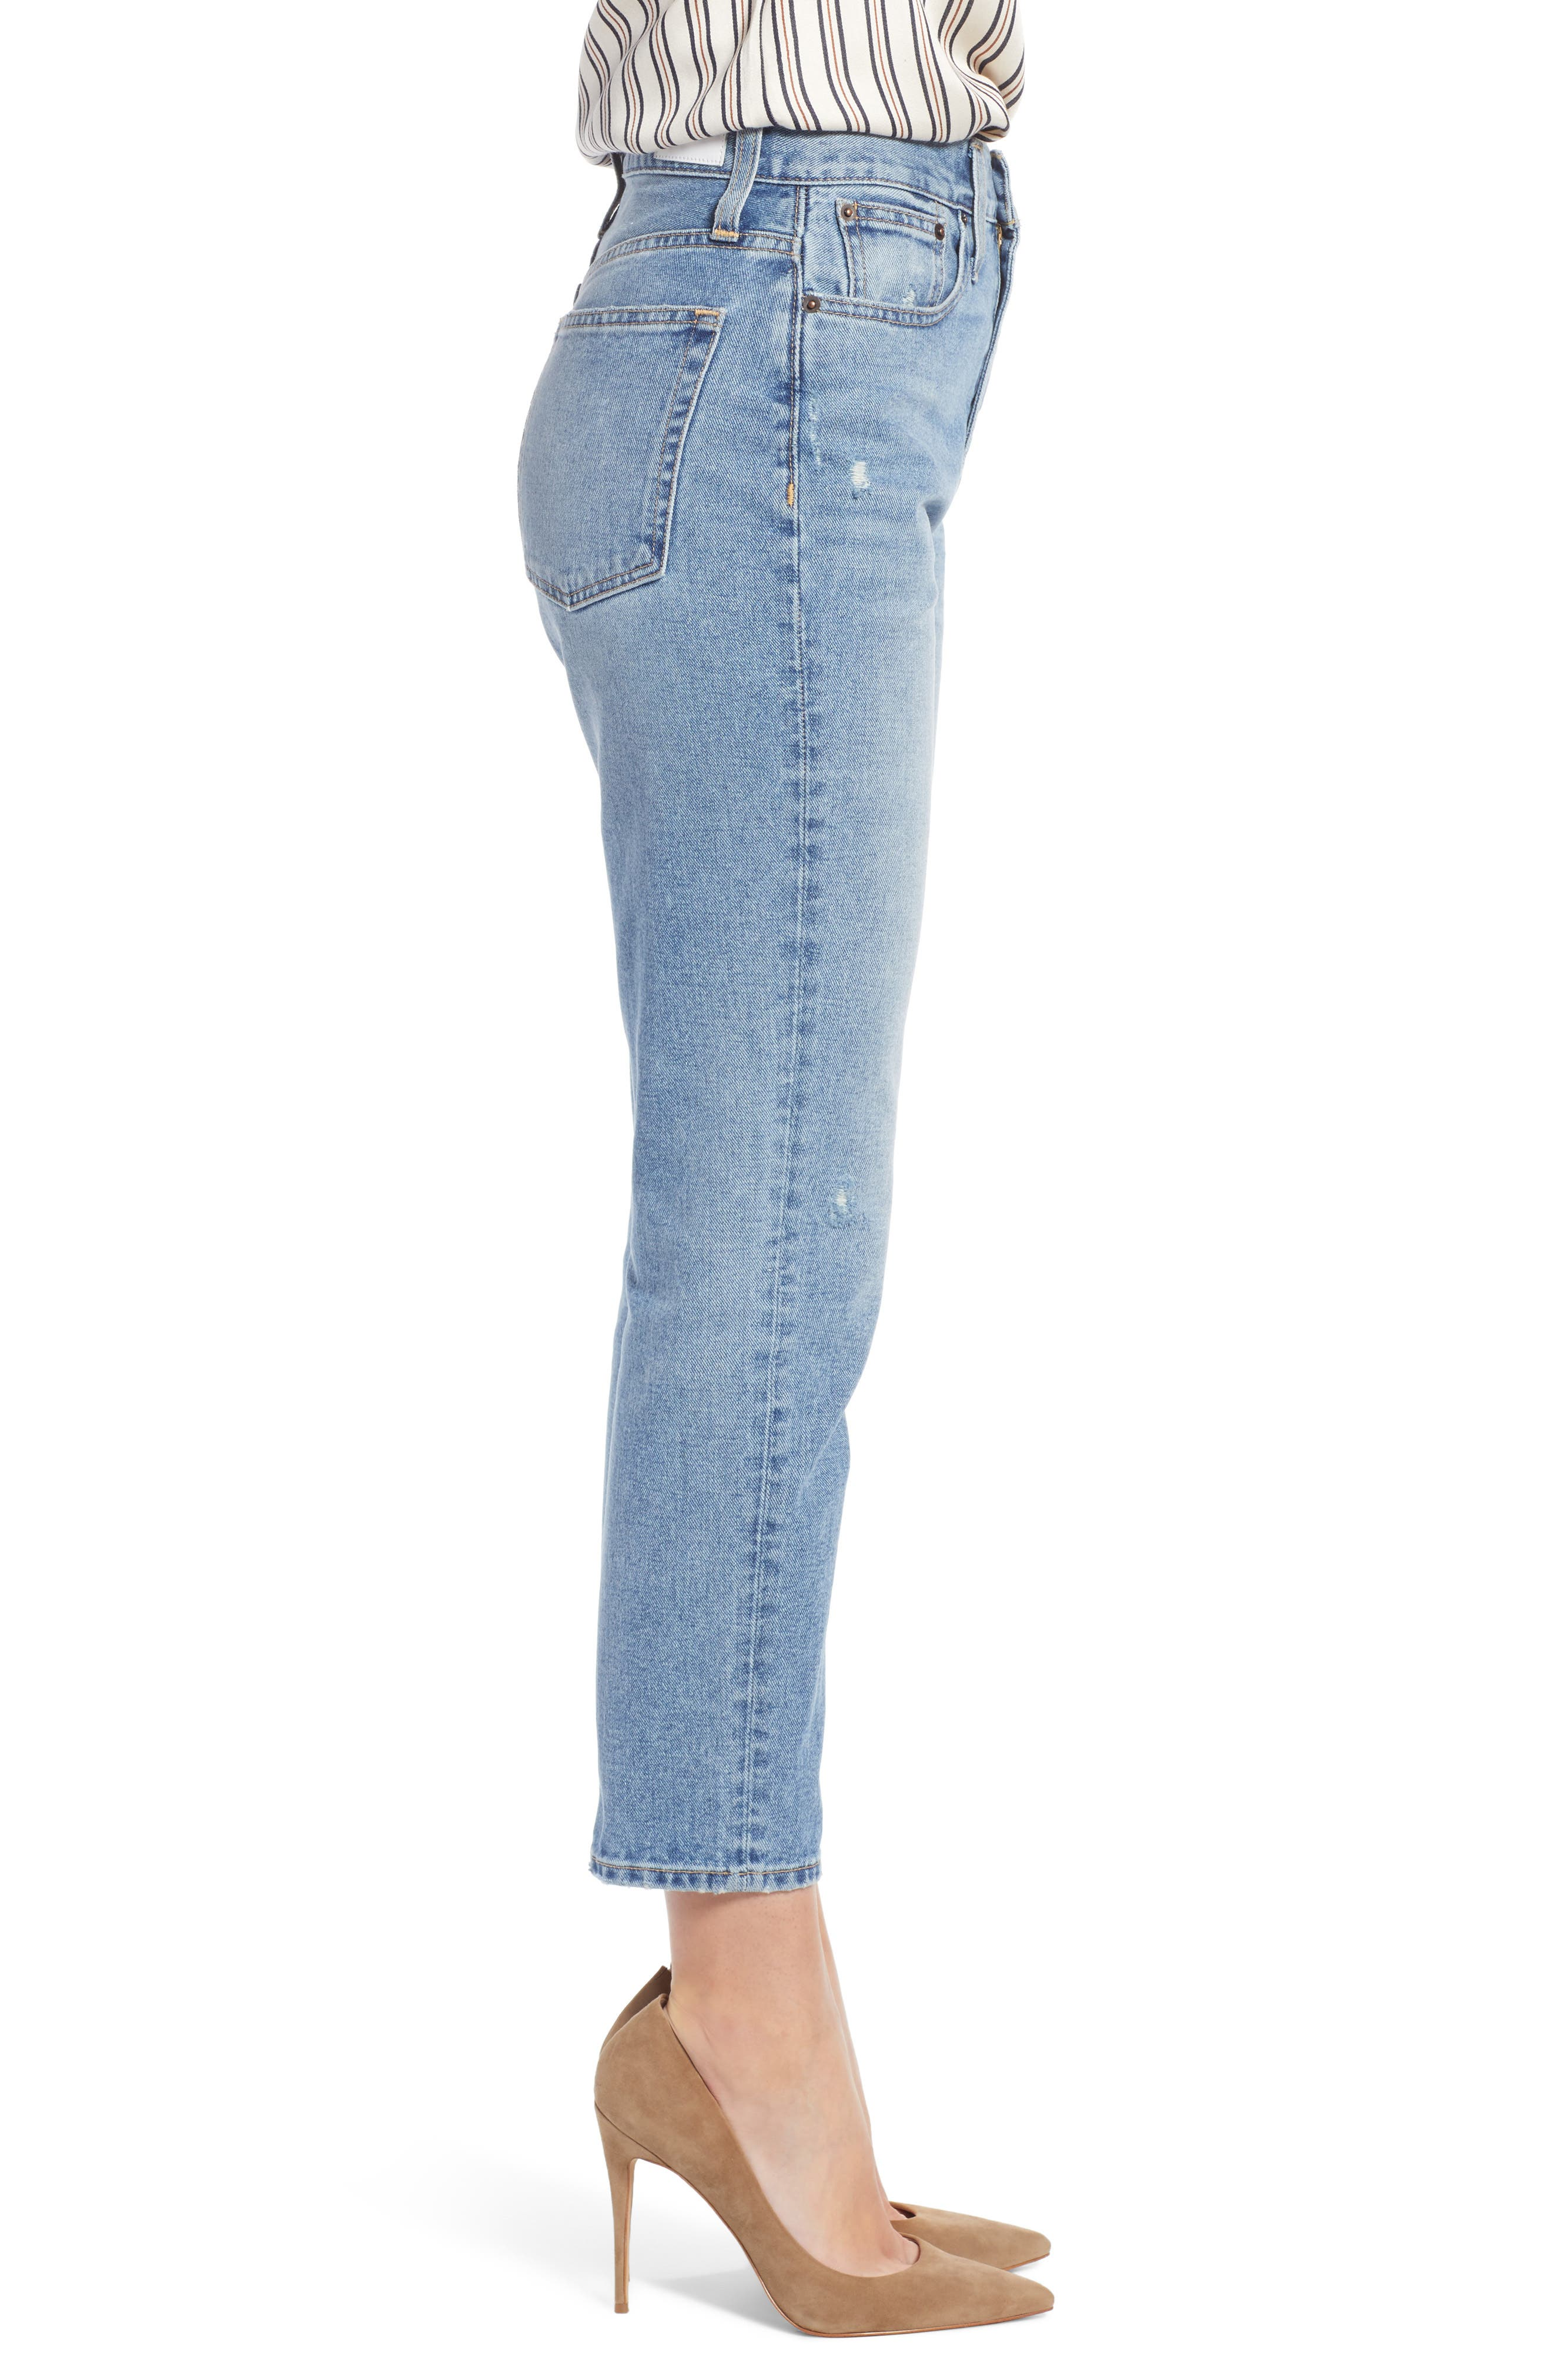 Cigarette Jeans,                             Alternate thumbnail 3, color,                             LIGHT INDIGO WASH